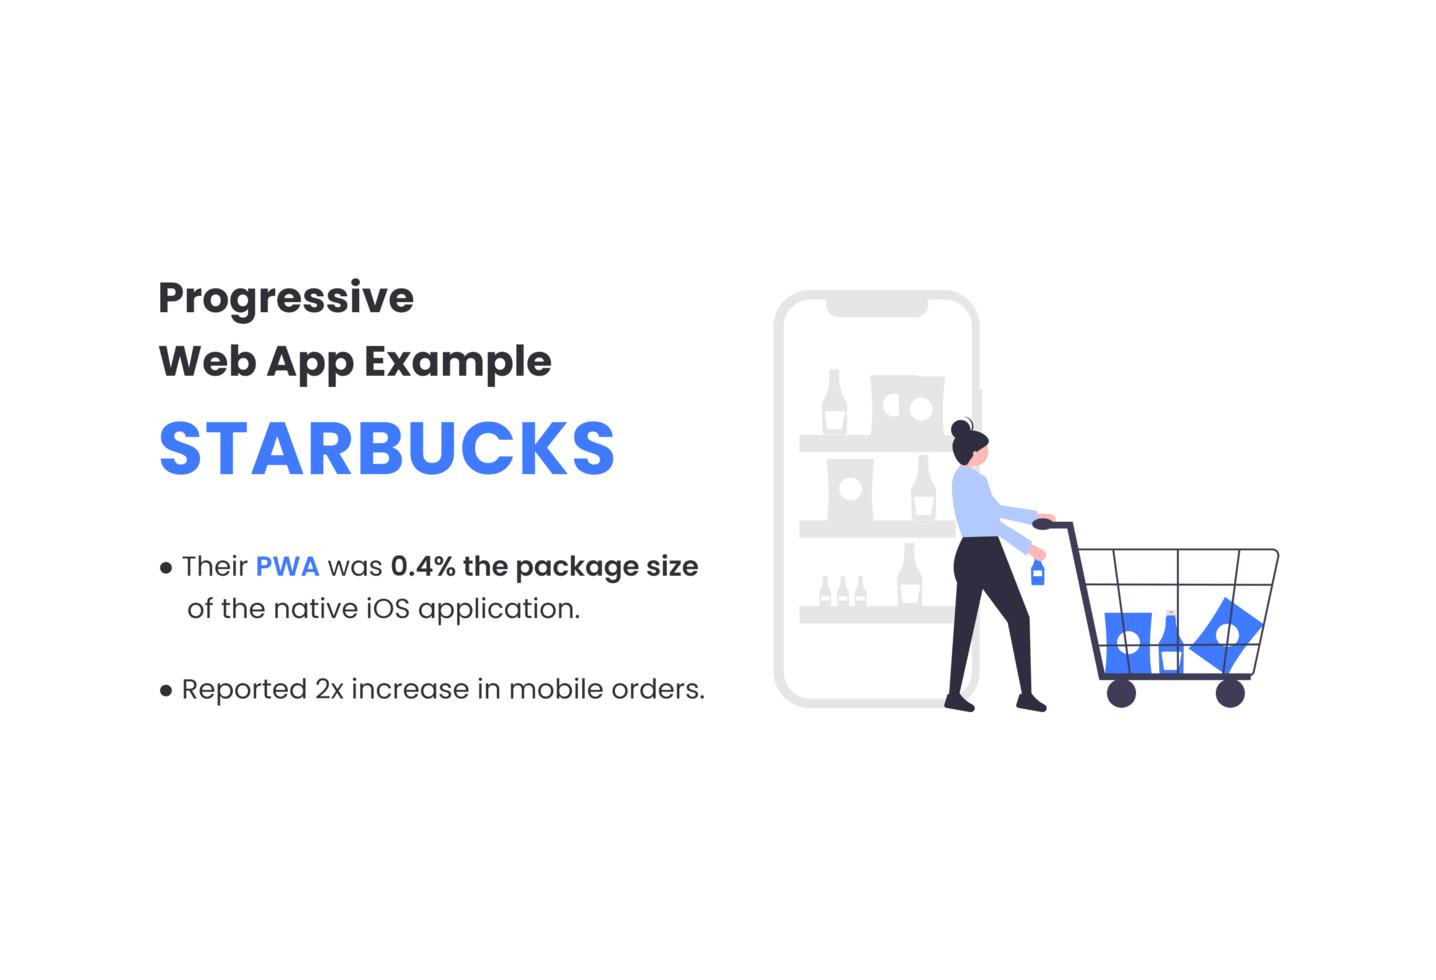 Progressive Web App Examples